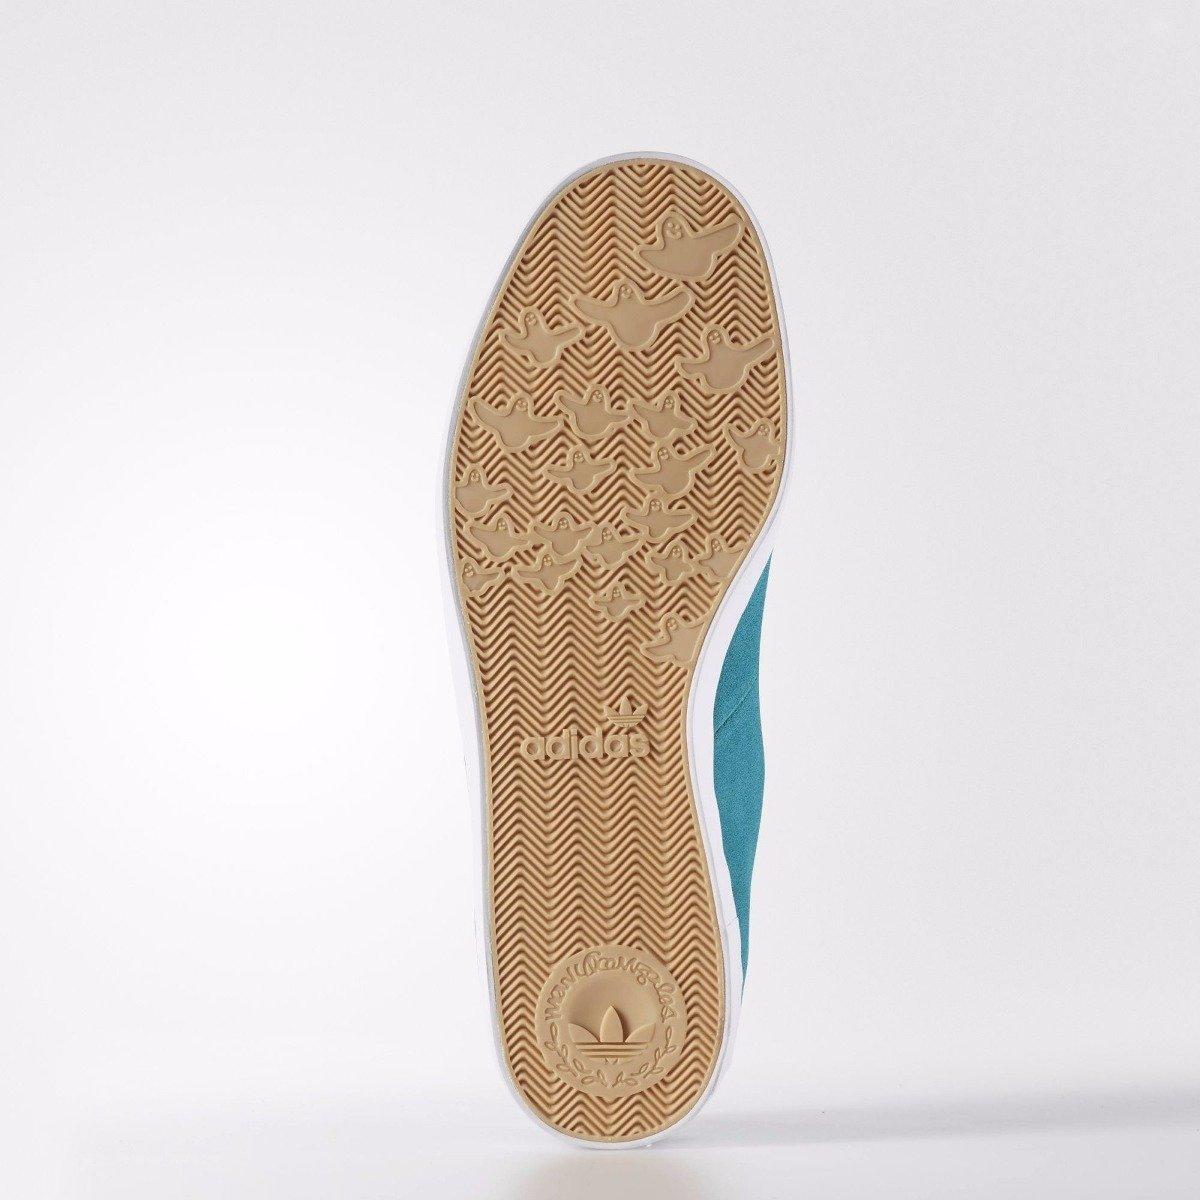 Originals Adidas Men's Gonz Shoesf37404eqt Pro Skate rdBtQCsxh